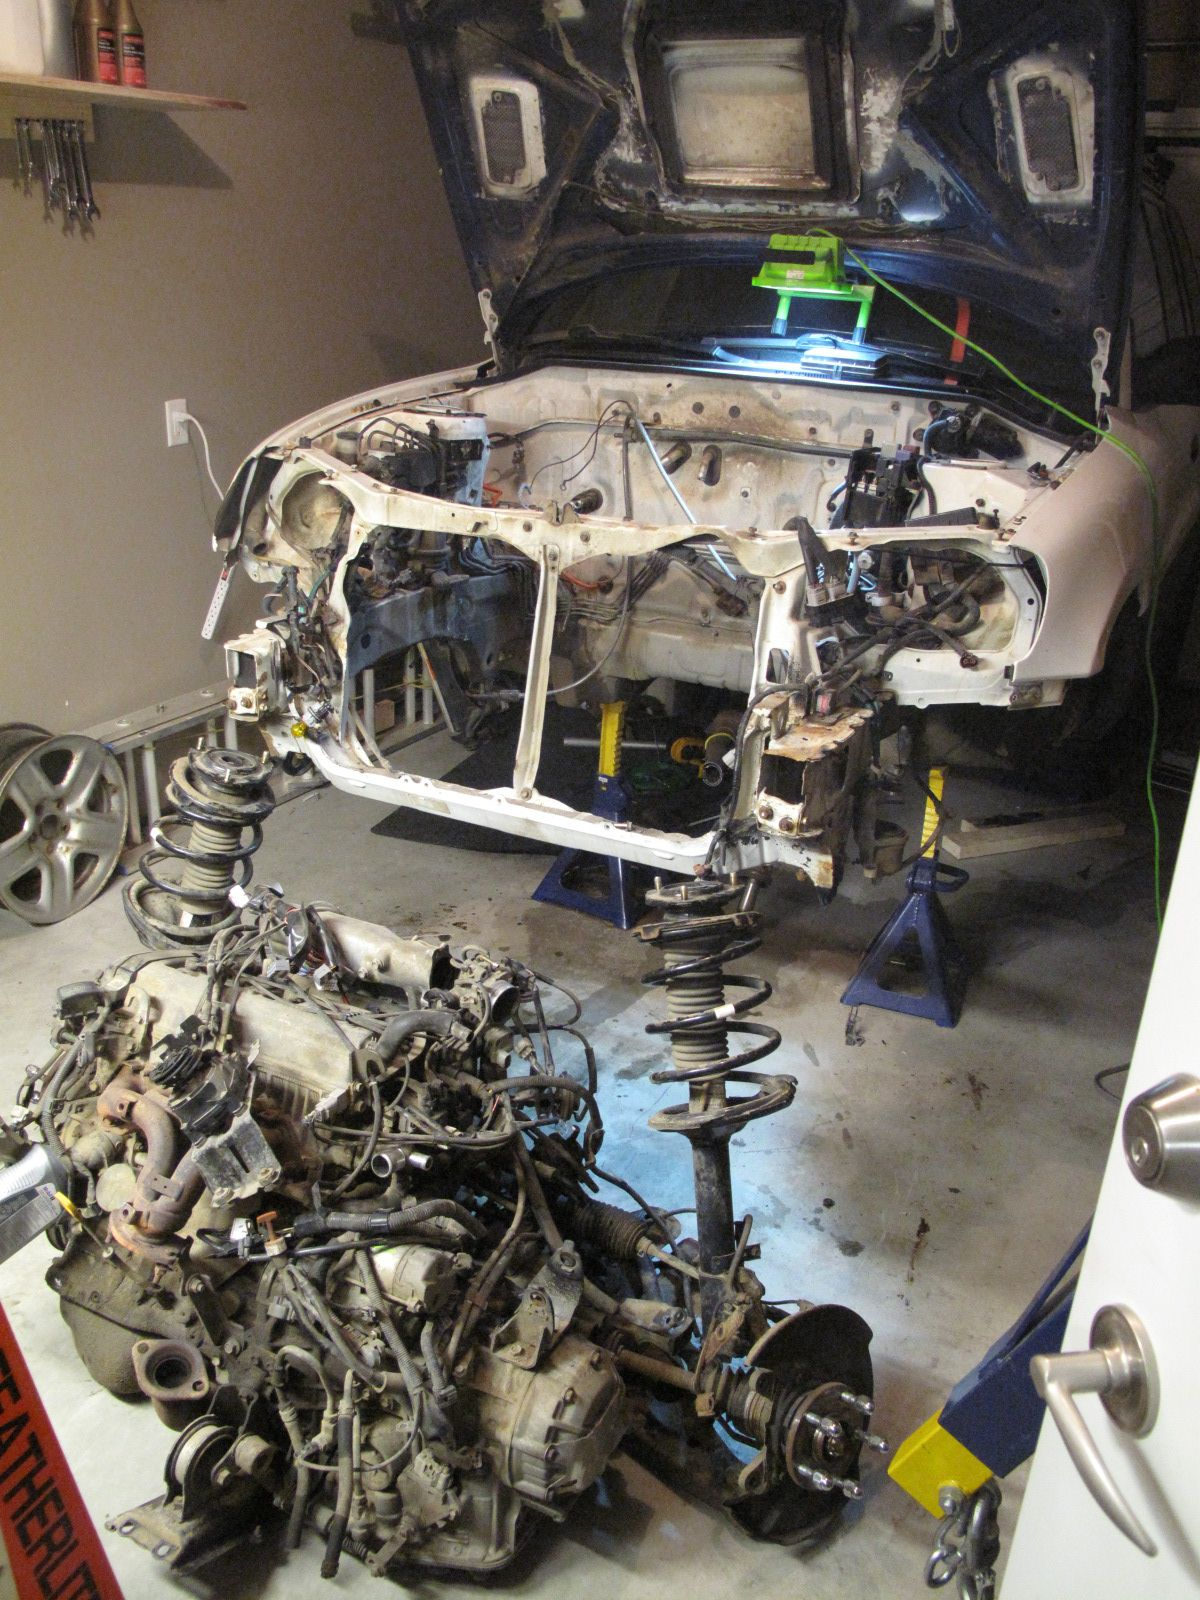 Yanking Rav4 Original 3s Fe 120hp Engine And Automatic Gearbox Rav4 Toyota Rav4 Toyota